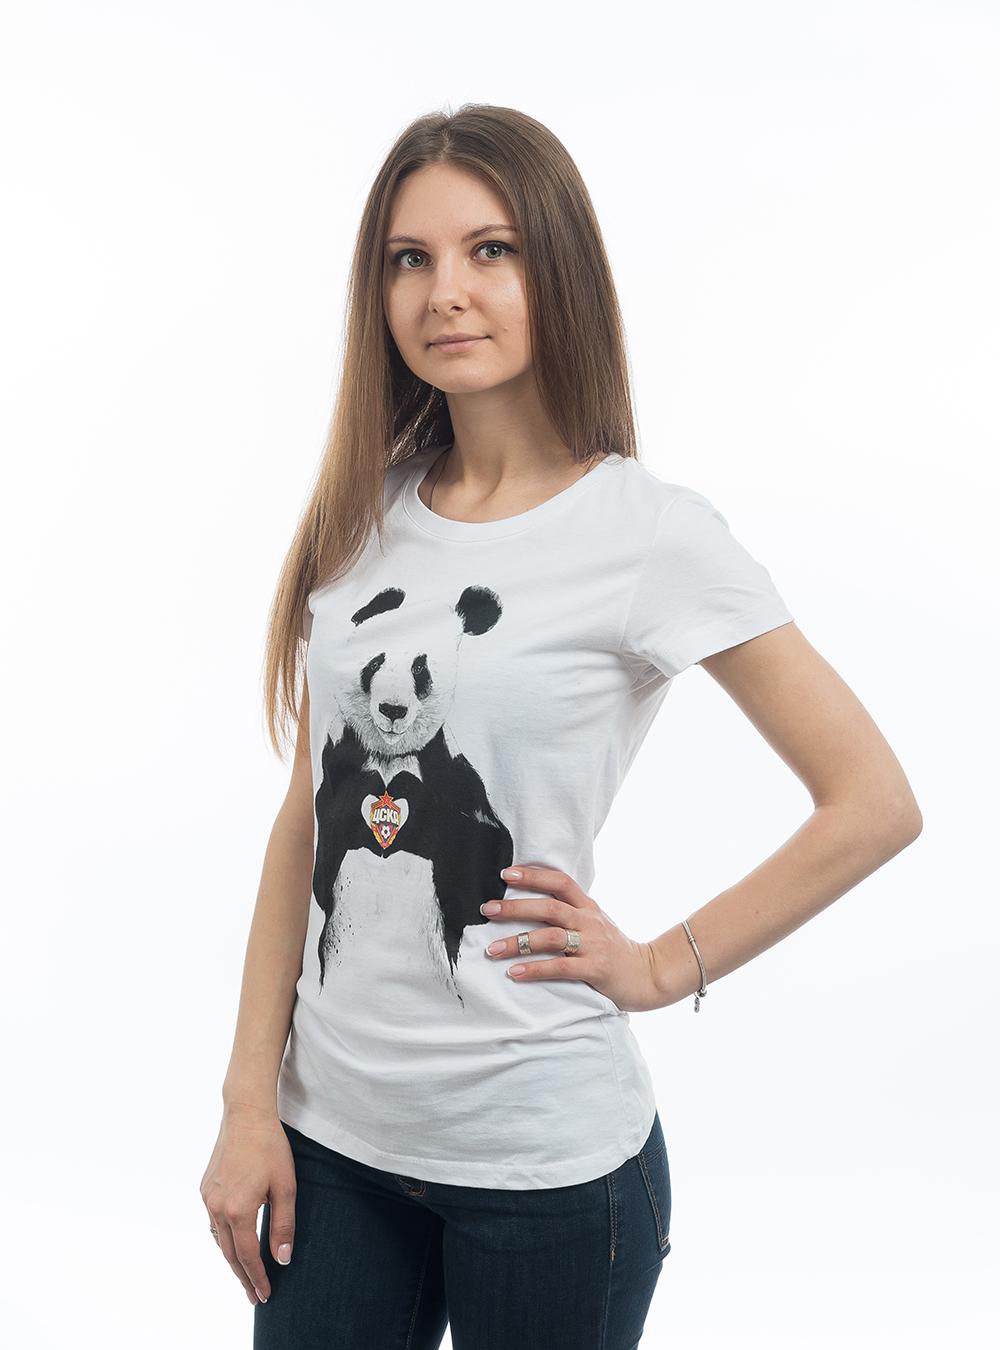 Футболка женская Панда (L)Футболки женские<br>Футболка женская Панда<br>